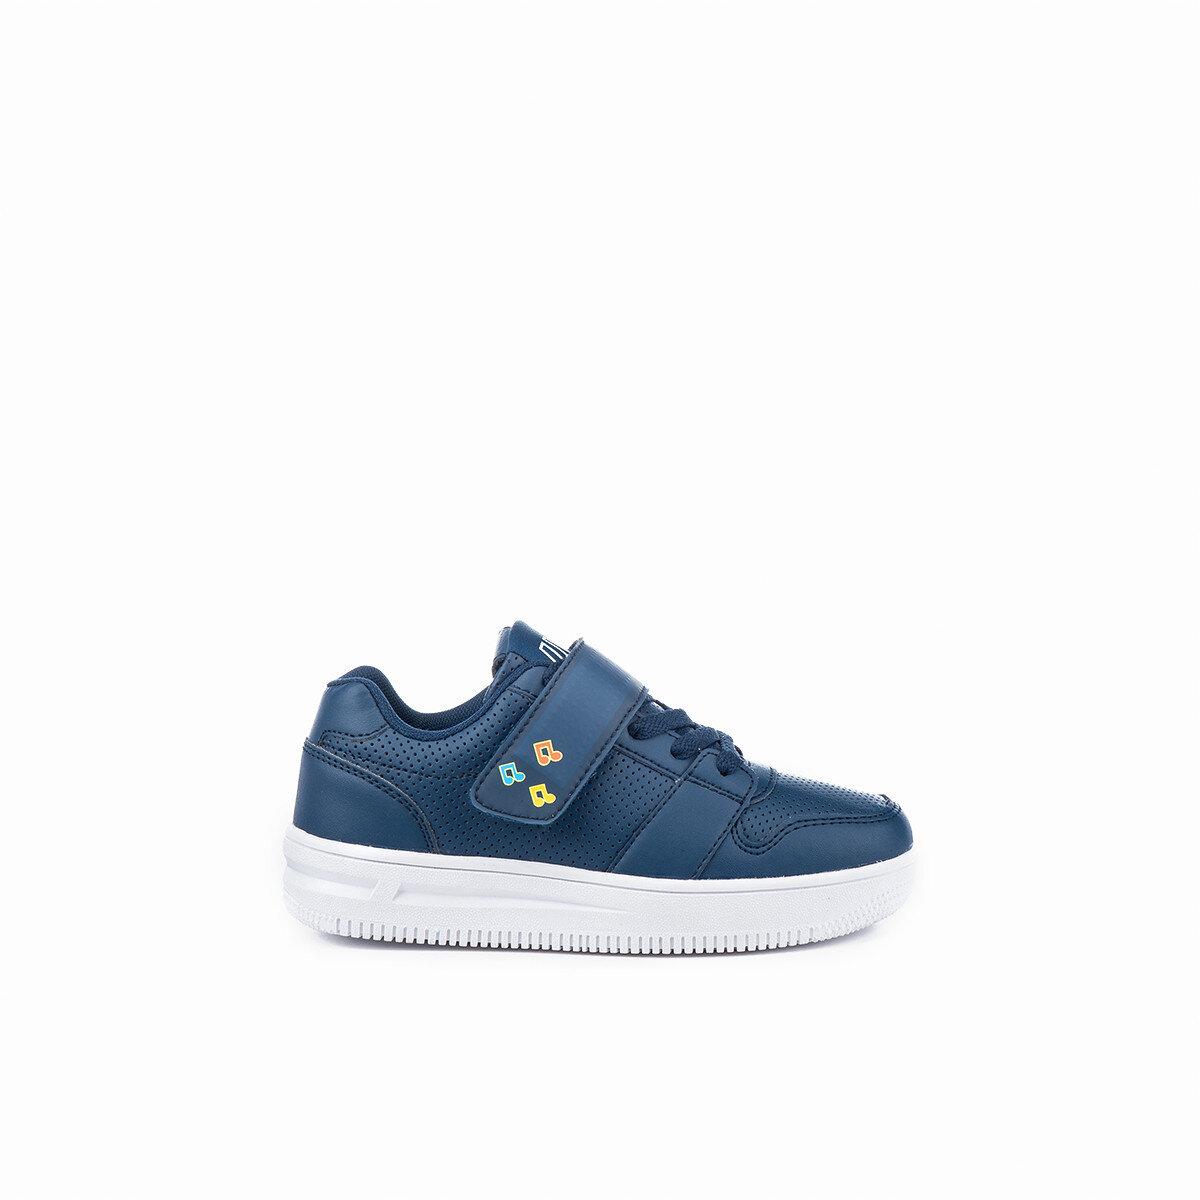 GAME Sneakers Bambino